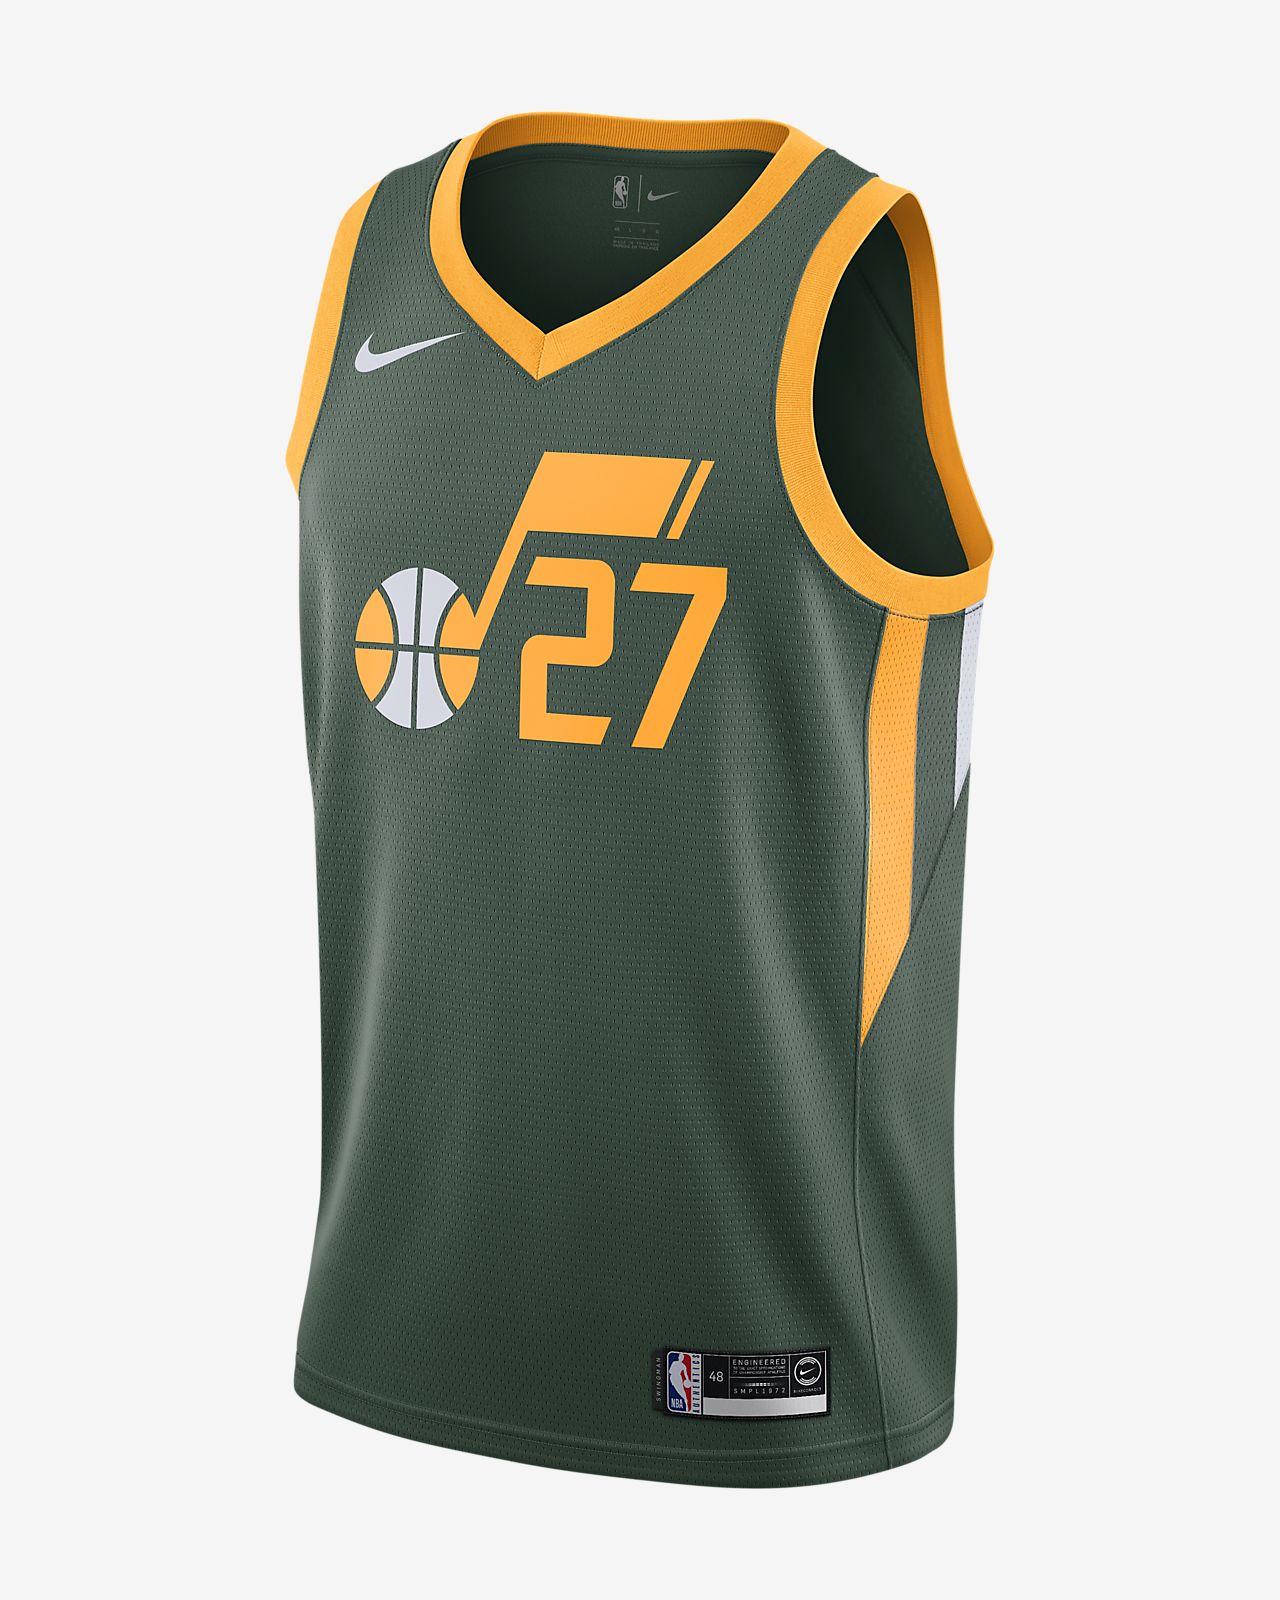 Męska koszulka Nike NBA Connected Jersey Rudy Gobert Earned Statement Edition Swingman (Utah Jazz)